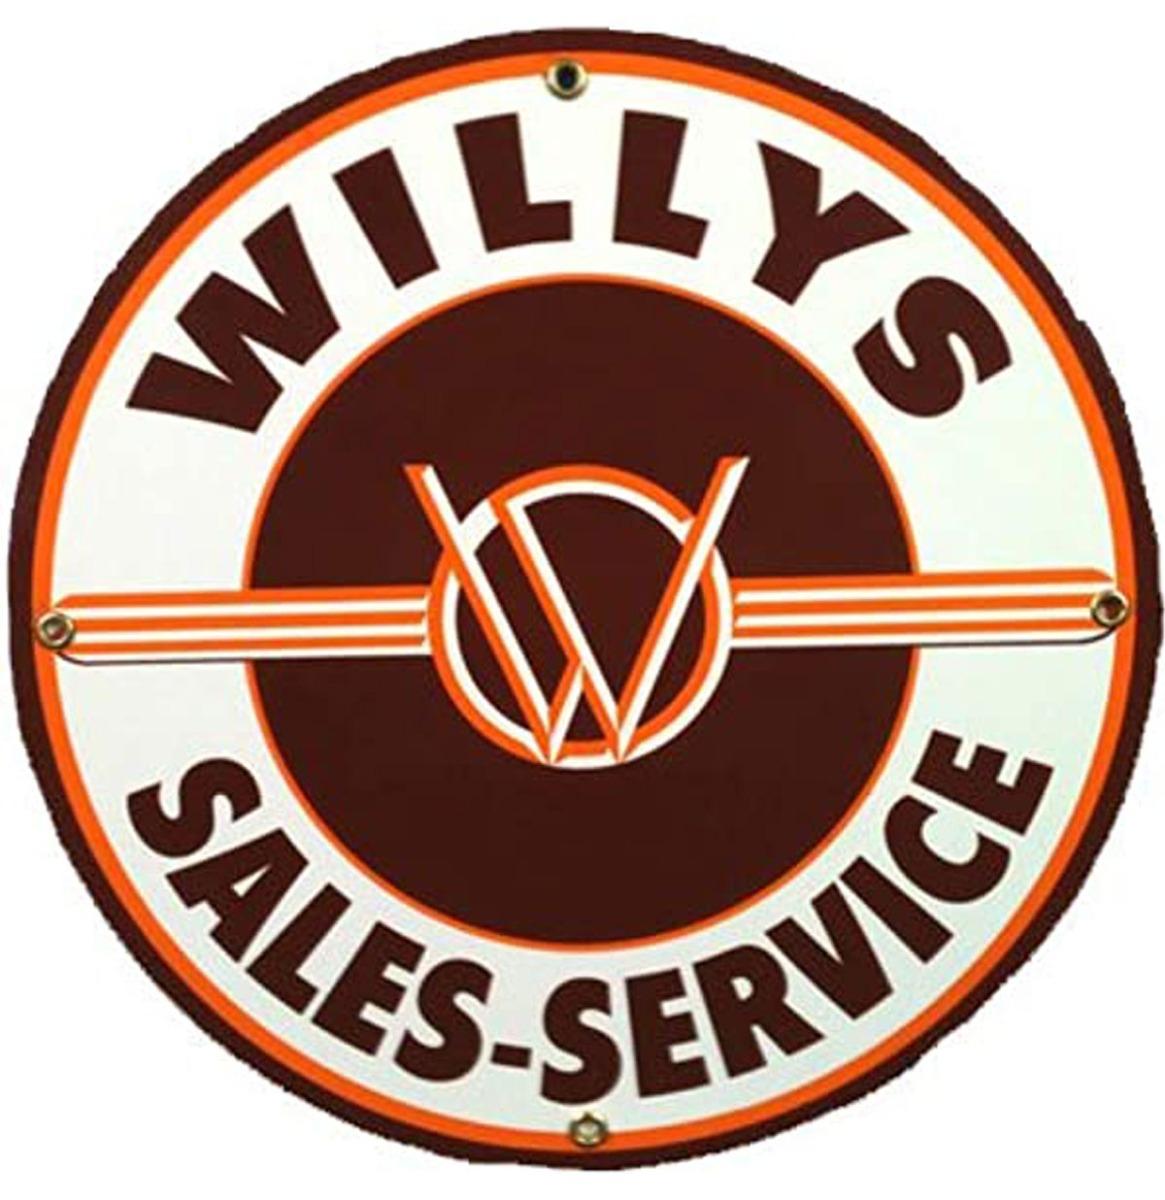 Willy's Sales-Service Metalen Bord 60 cm